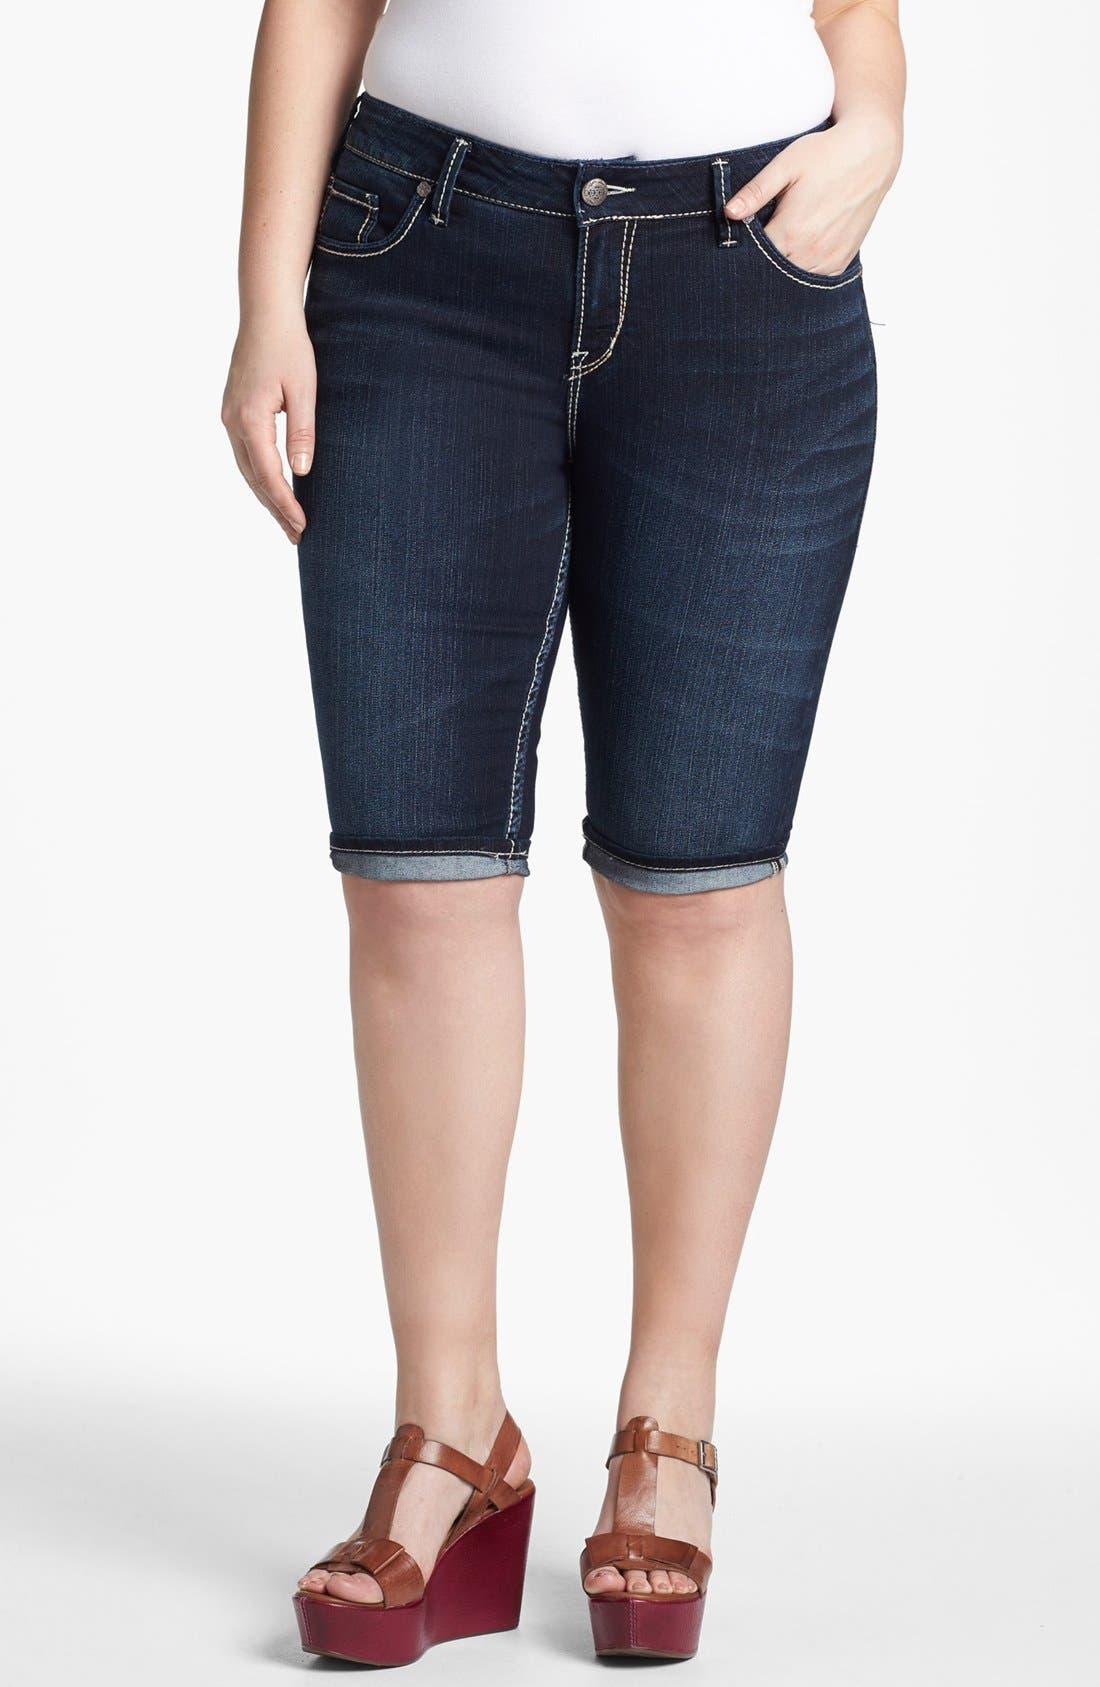 Alternate Image 1 Selected - Silver Jeans Co. 'Suki' Denim Bermuda Shorts (Juniors Plus)